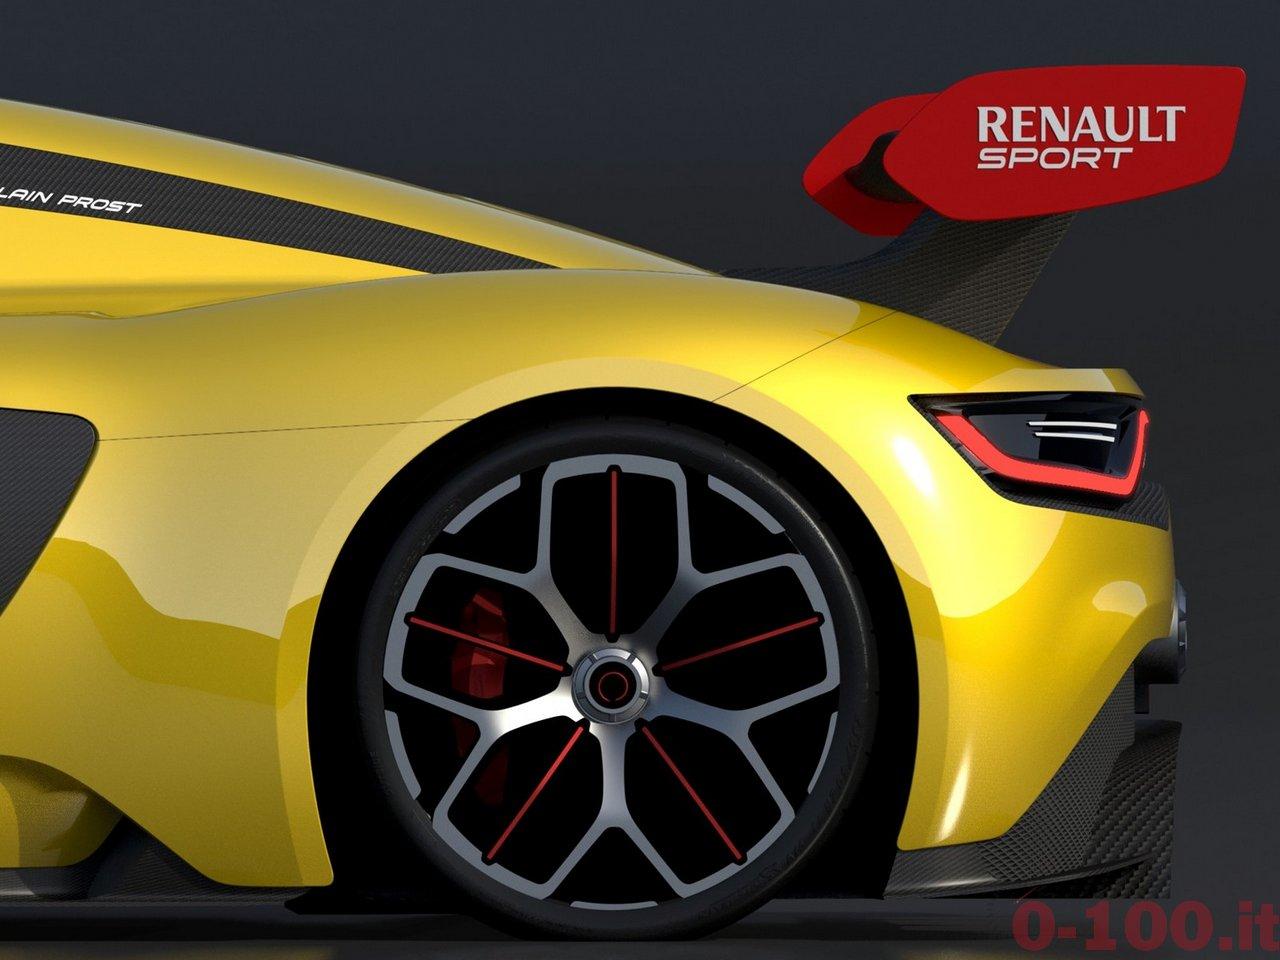 renault-sport-r-s-01-alpine_0-100_19